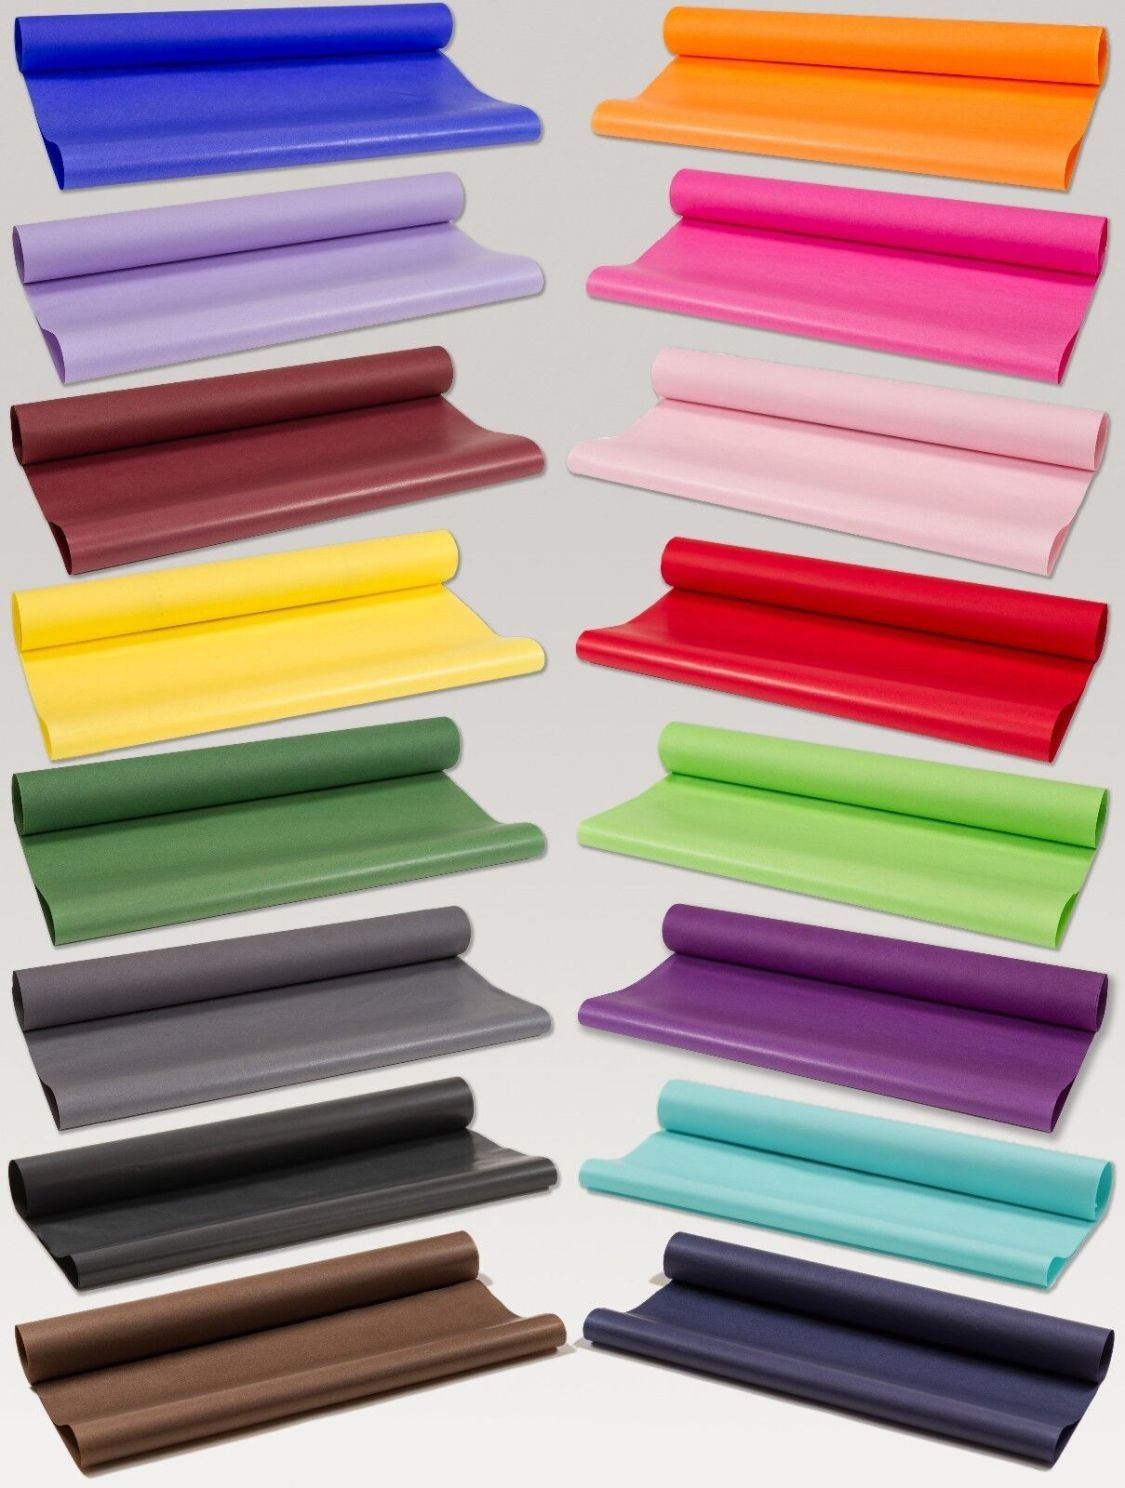 8,00€/KG Seidenpapier farbig 50x75cm 5KG=ca.430 Bogen Blumenseide Farbauswahl